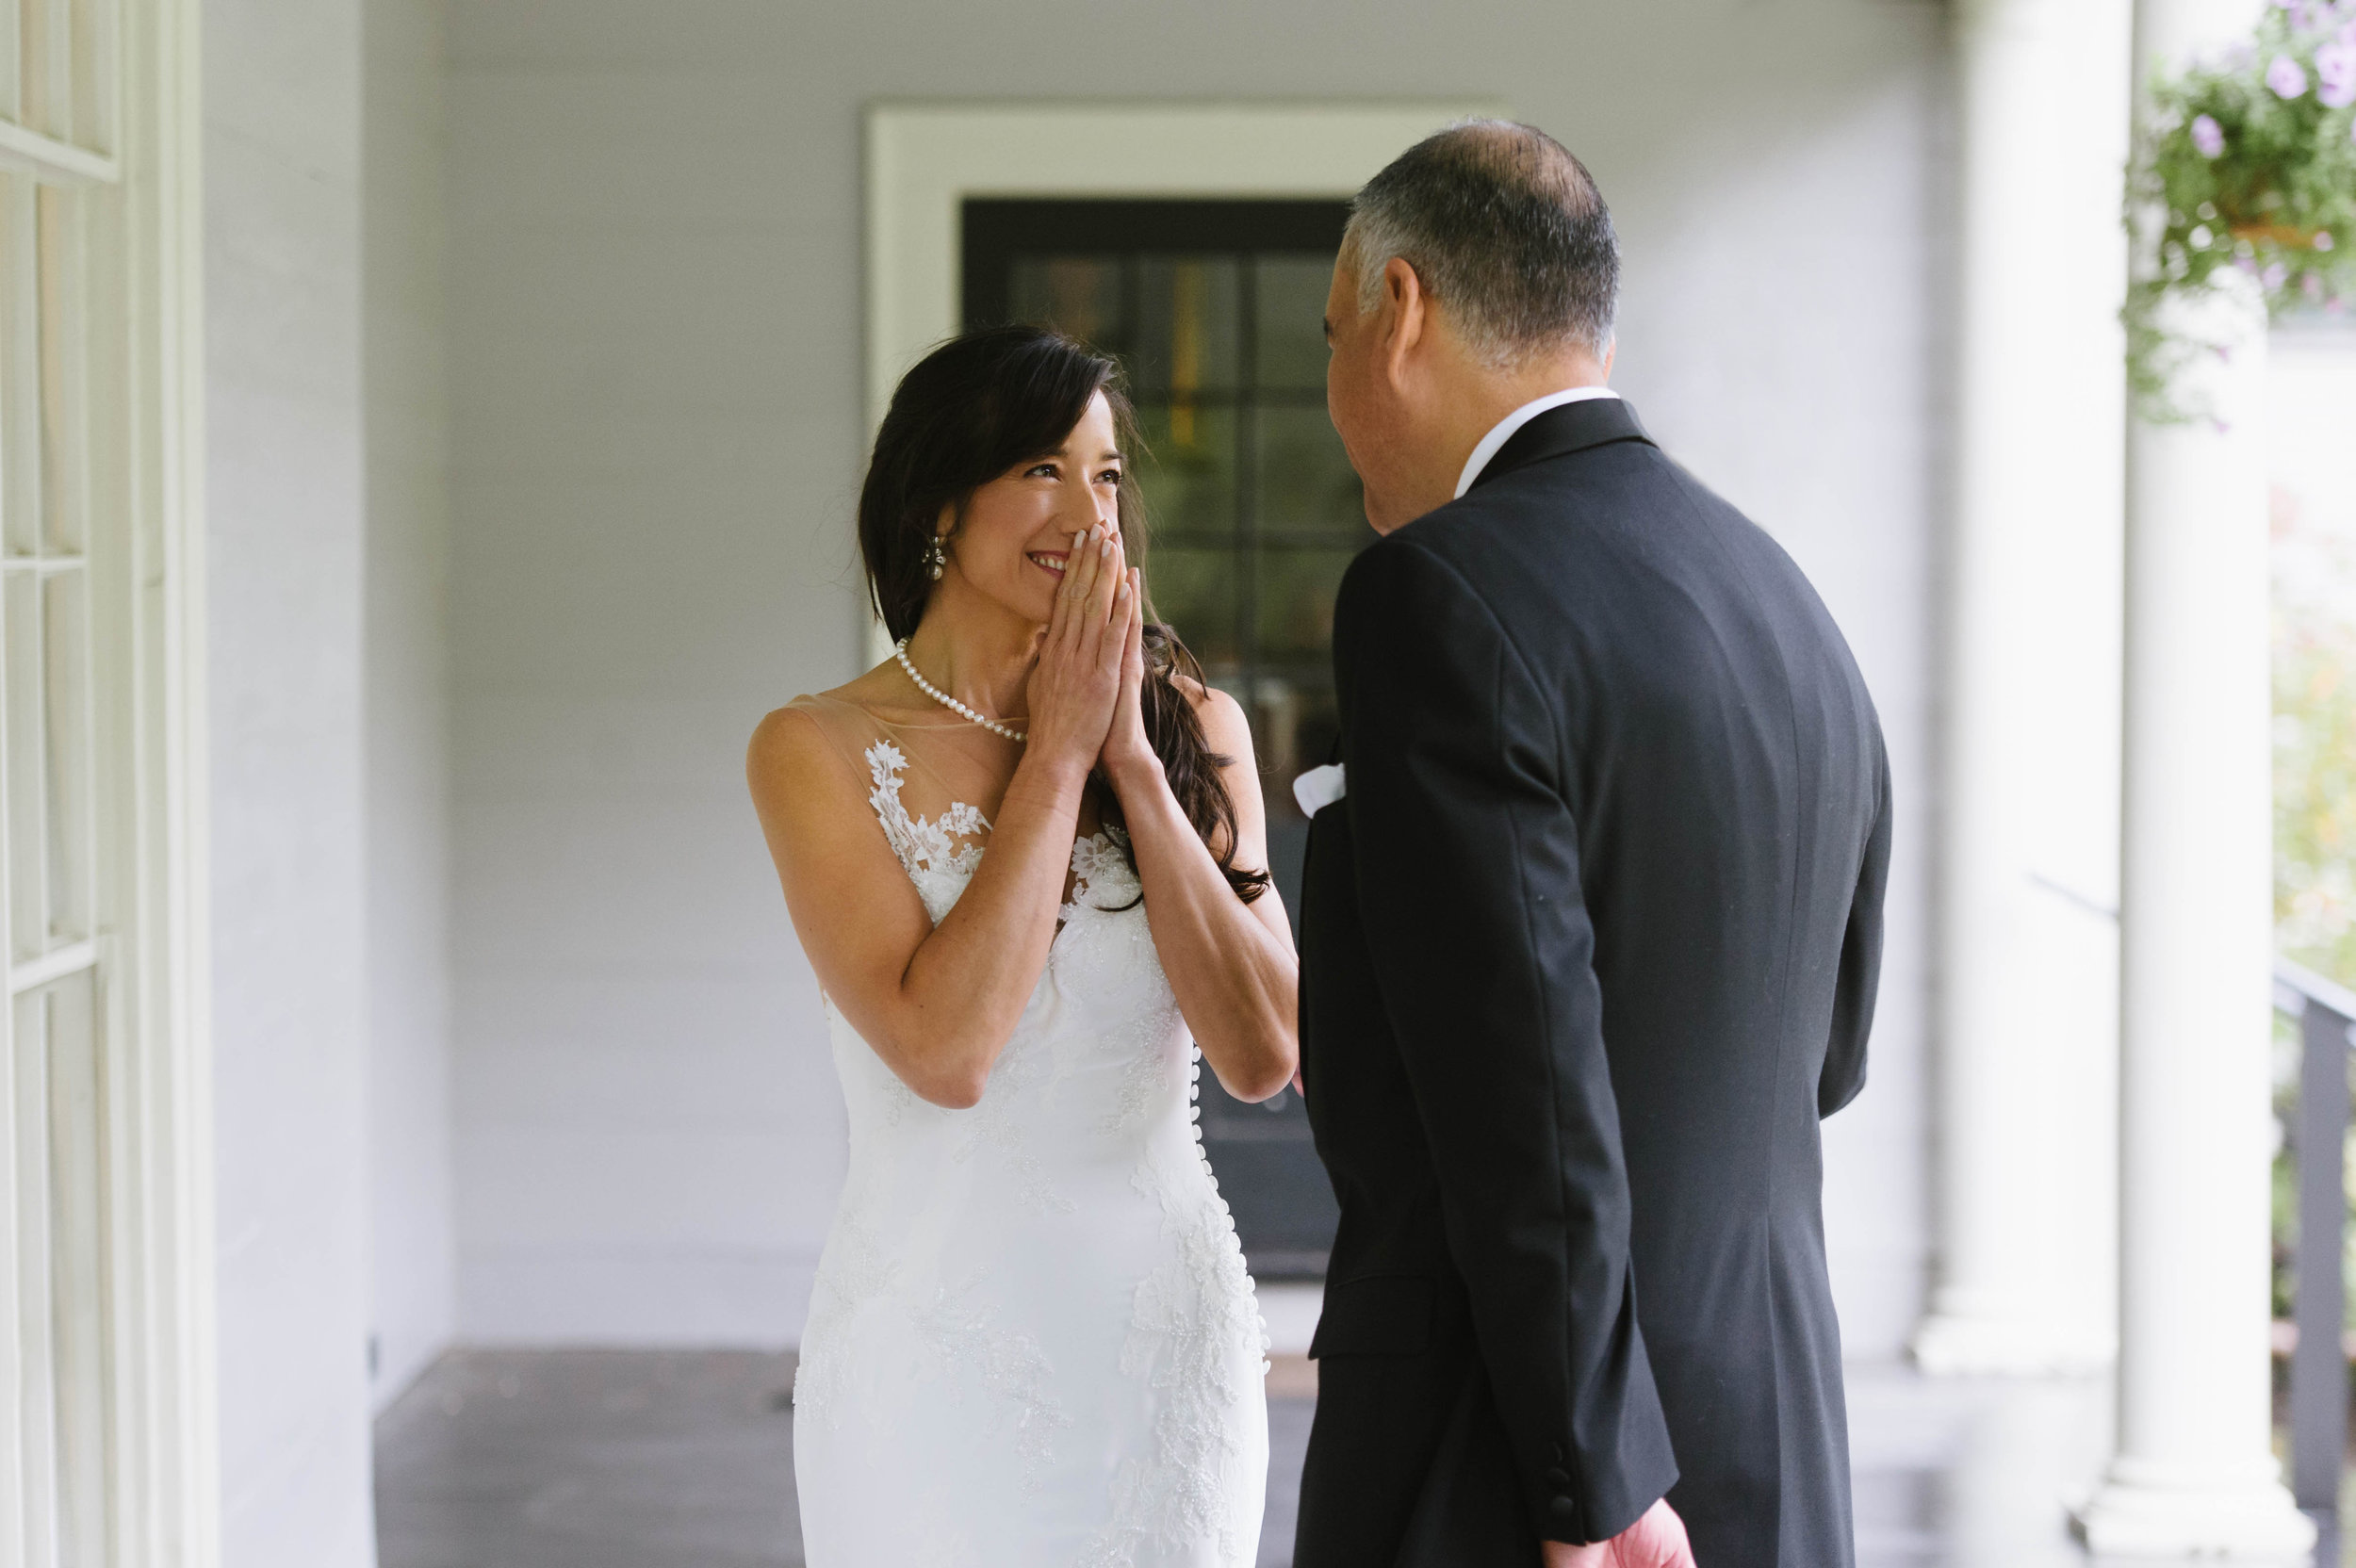 Candid-Wedding-Photography-Boston19.jpg